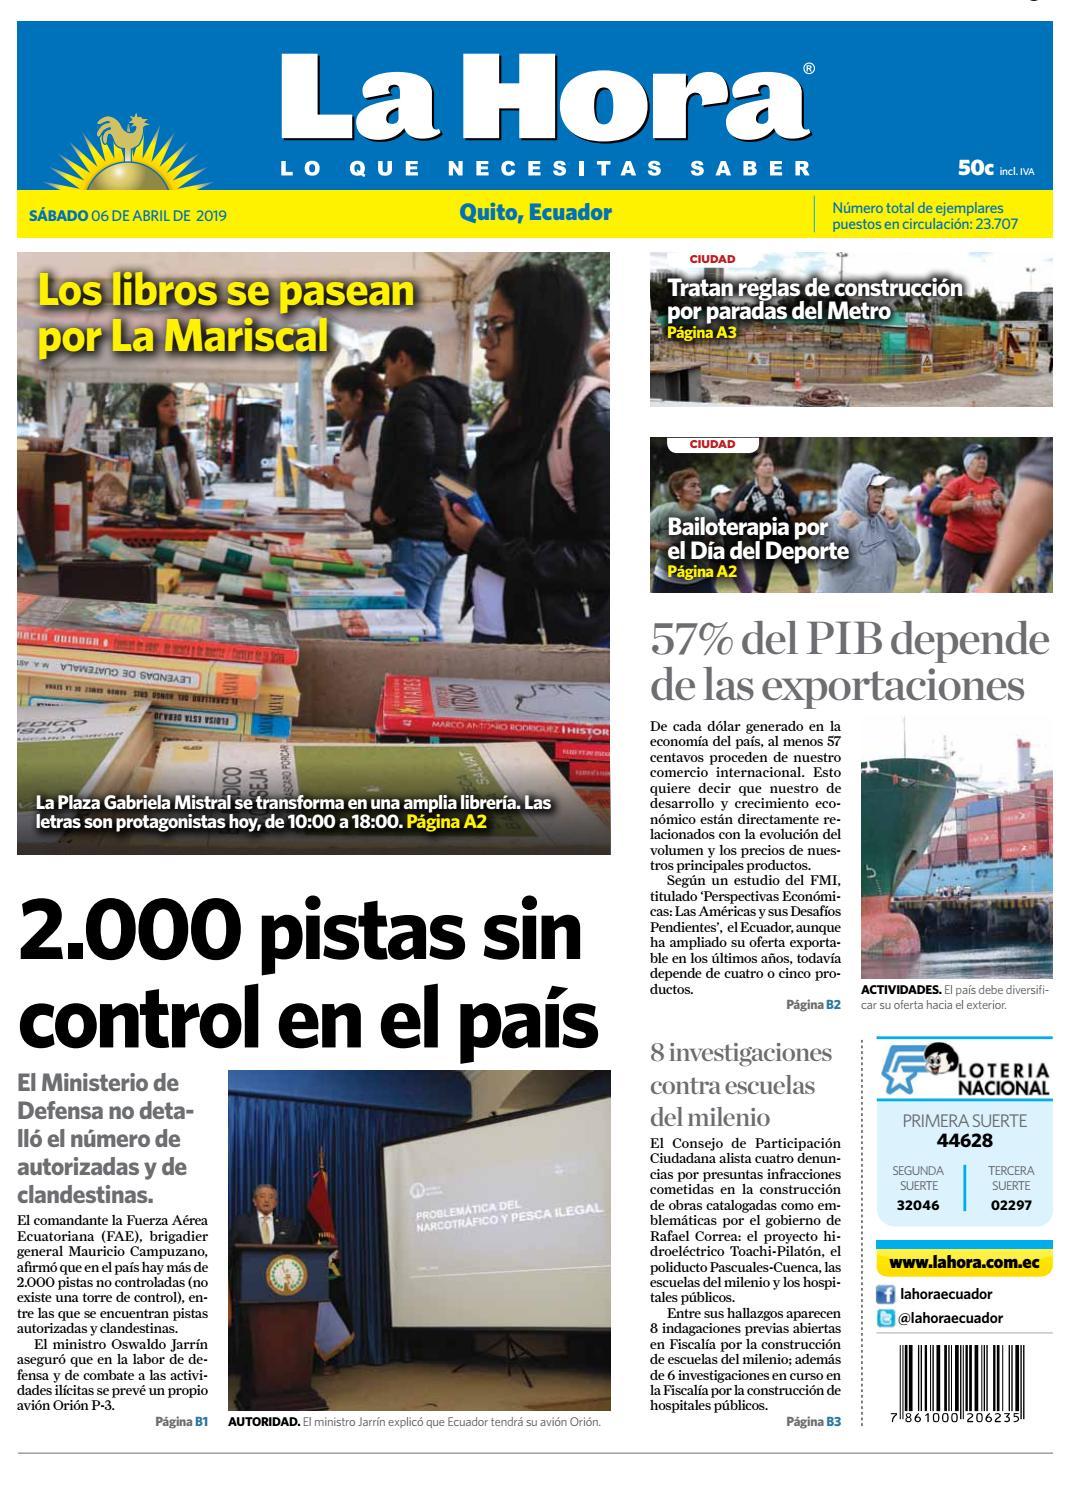 Citas Por Internet Oruro - 684205